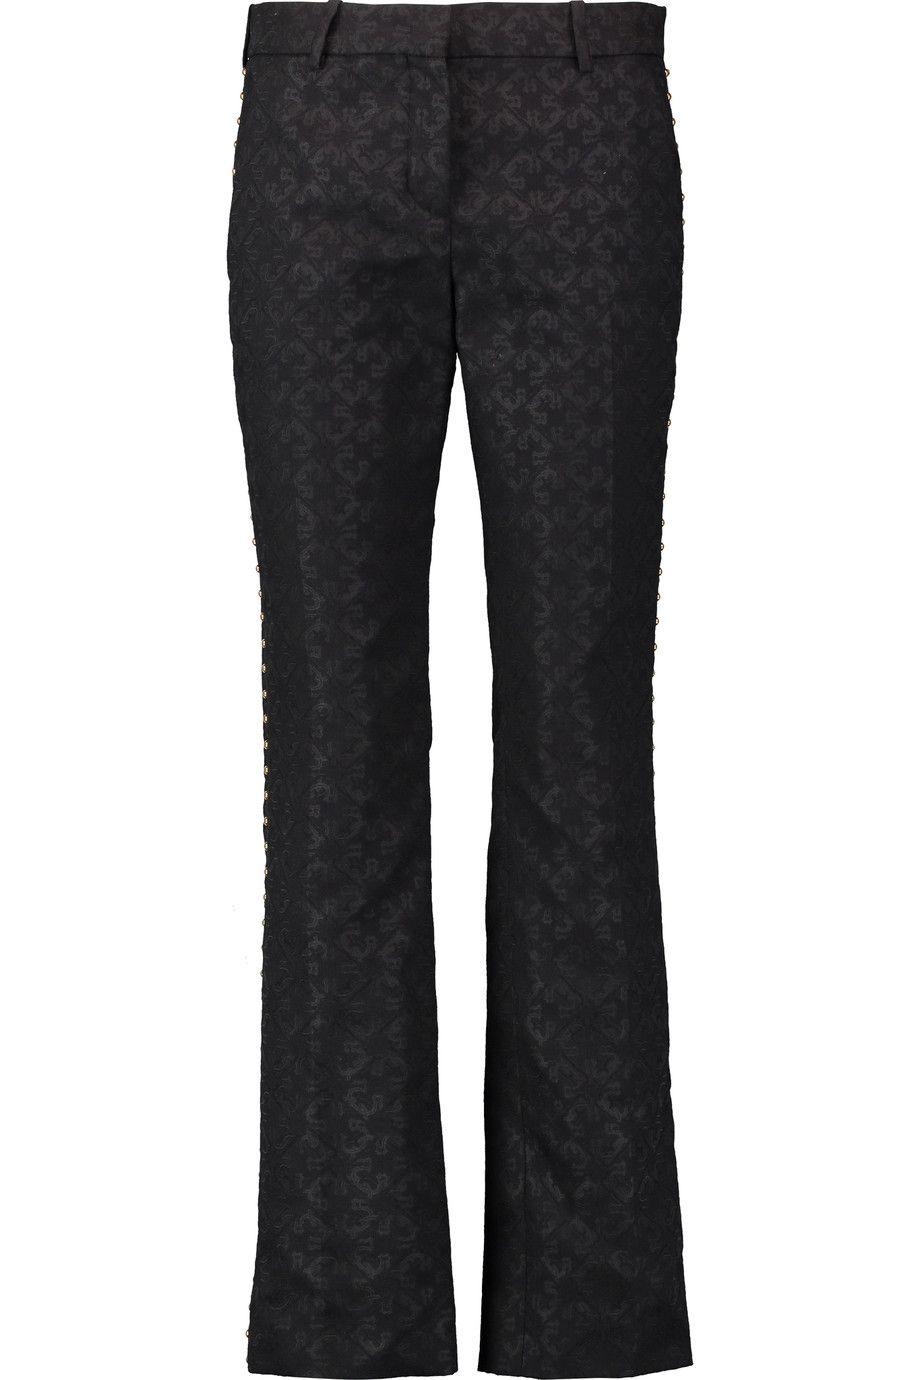 ROBERTO CAVALLI . #robertocavalli #cloth #pants